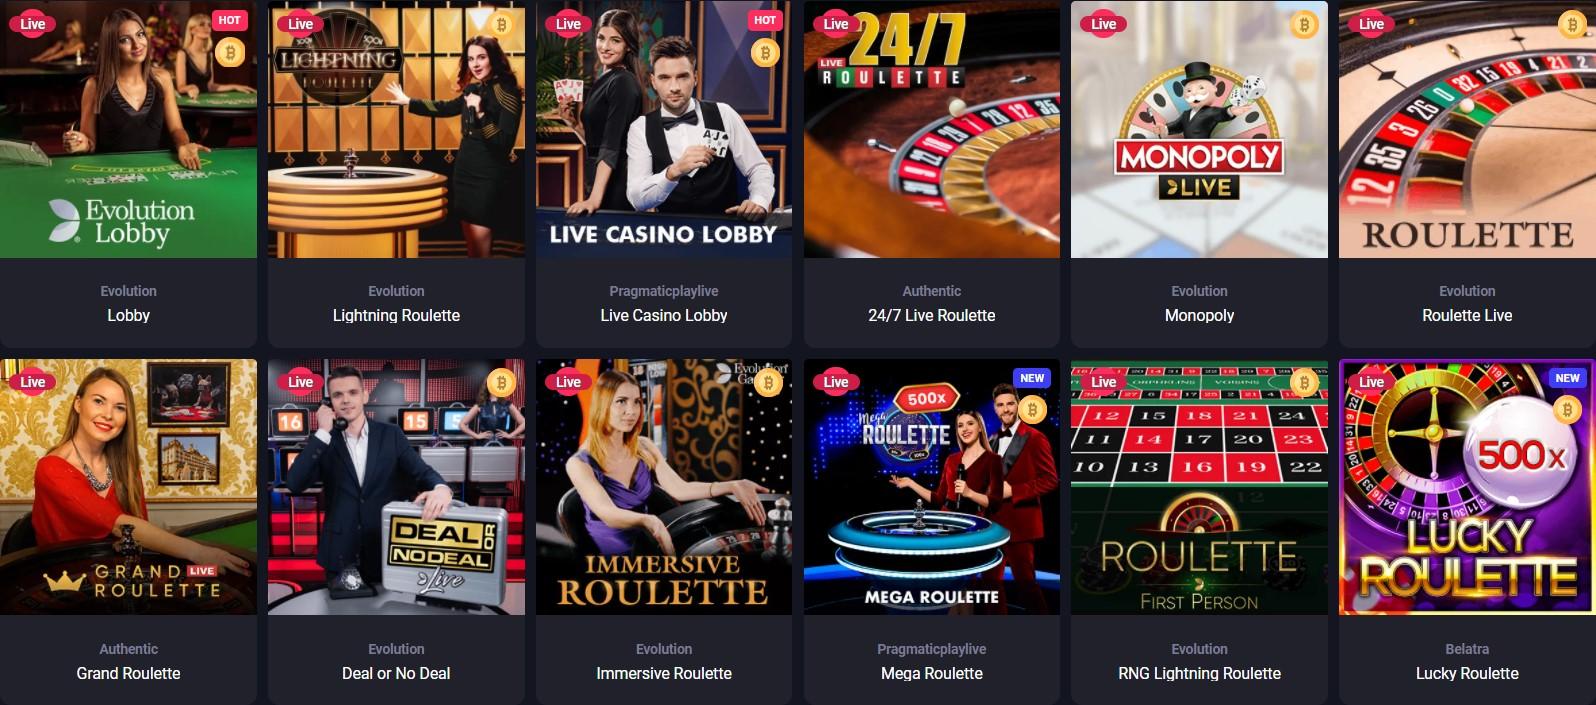 woocasino live casino games selection